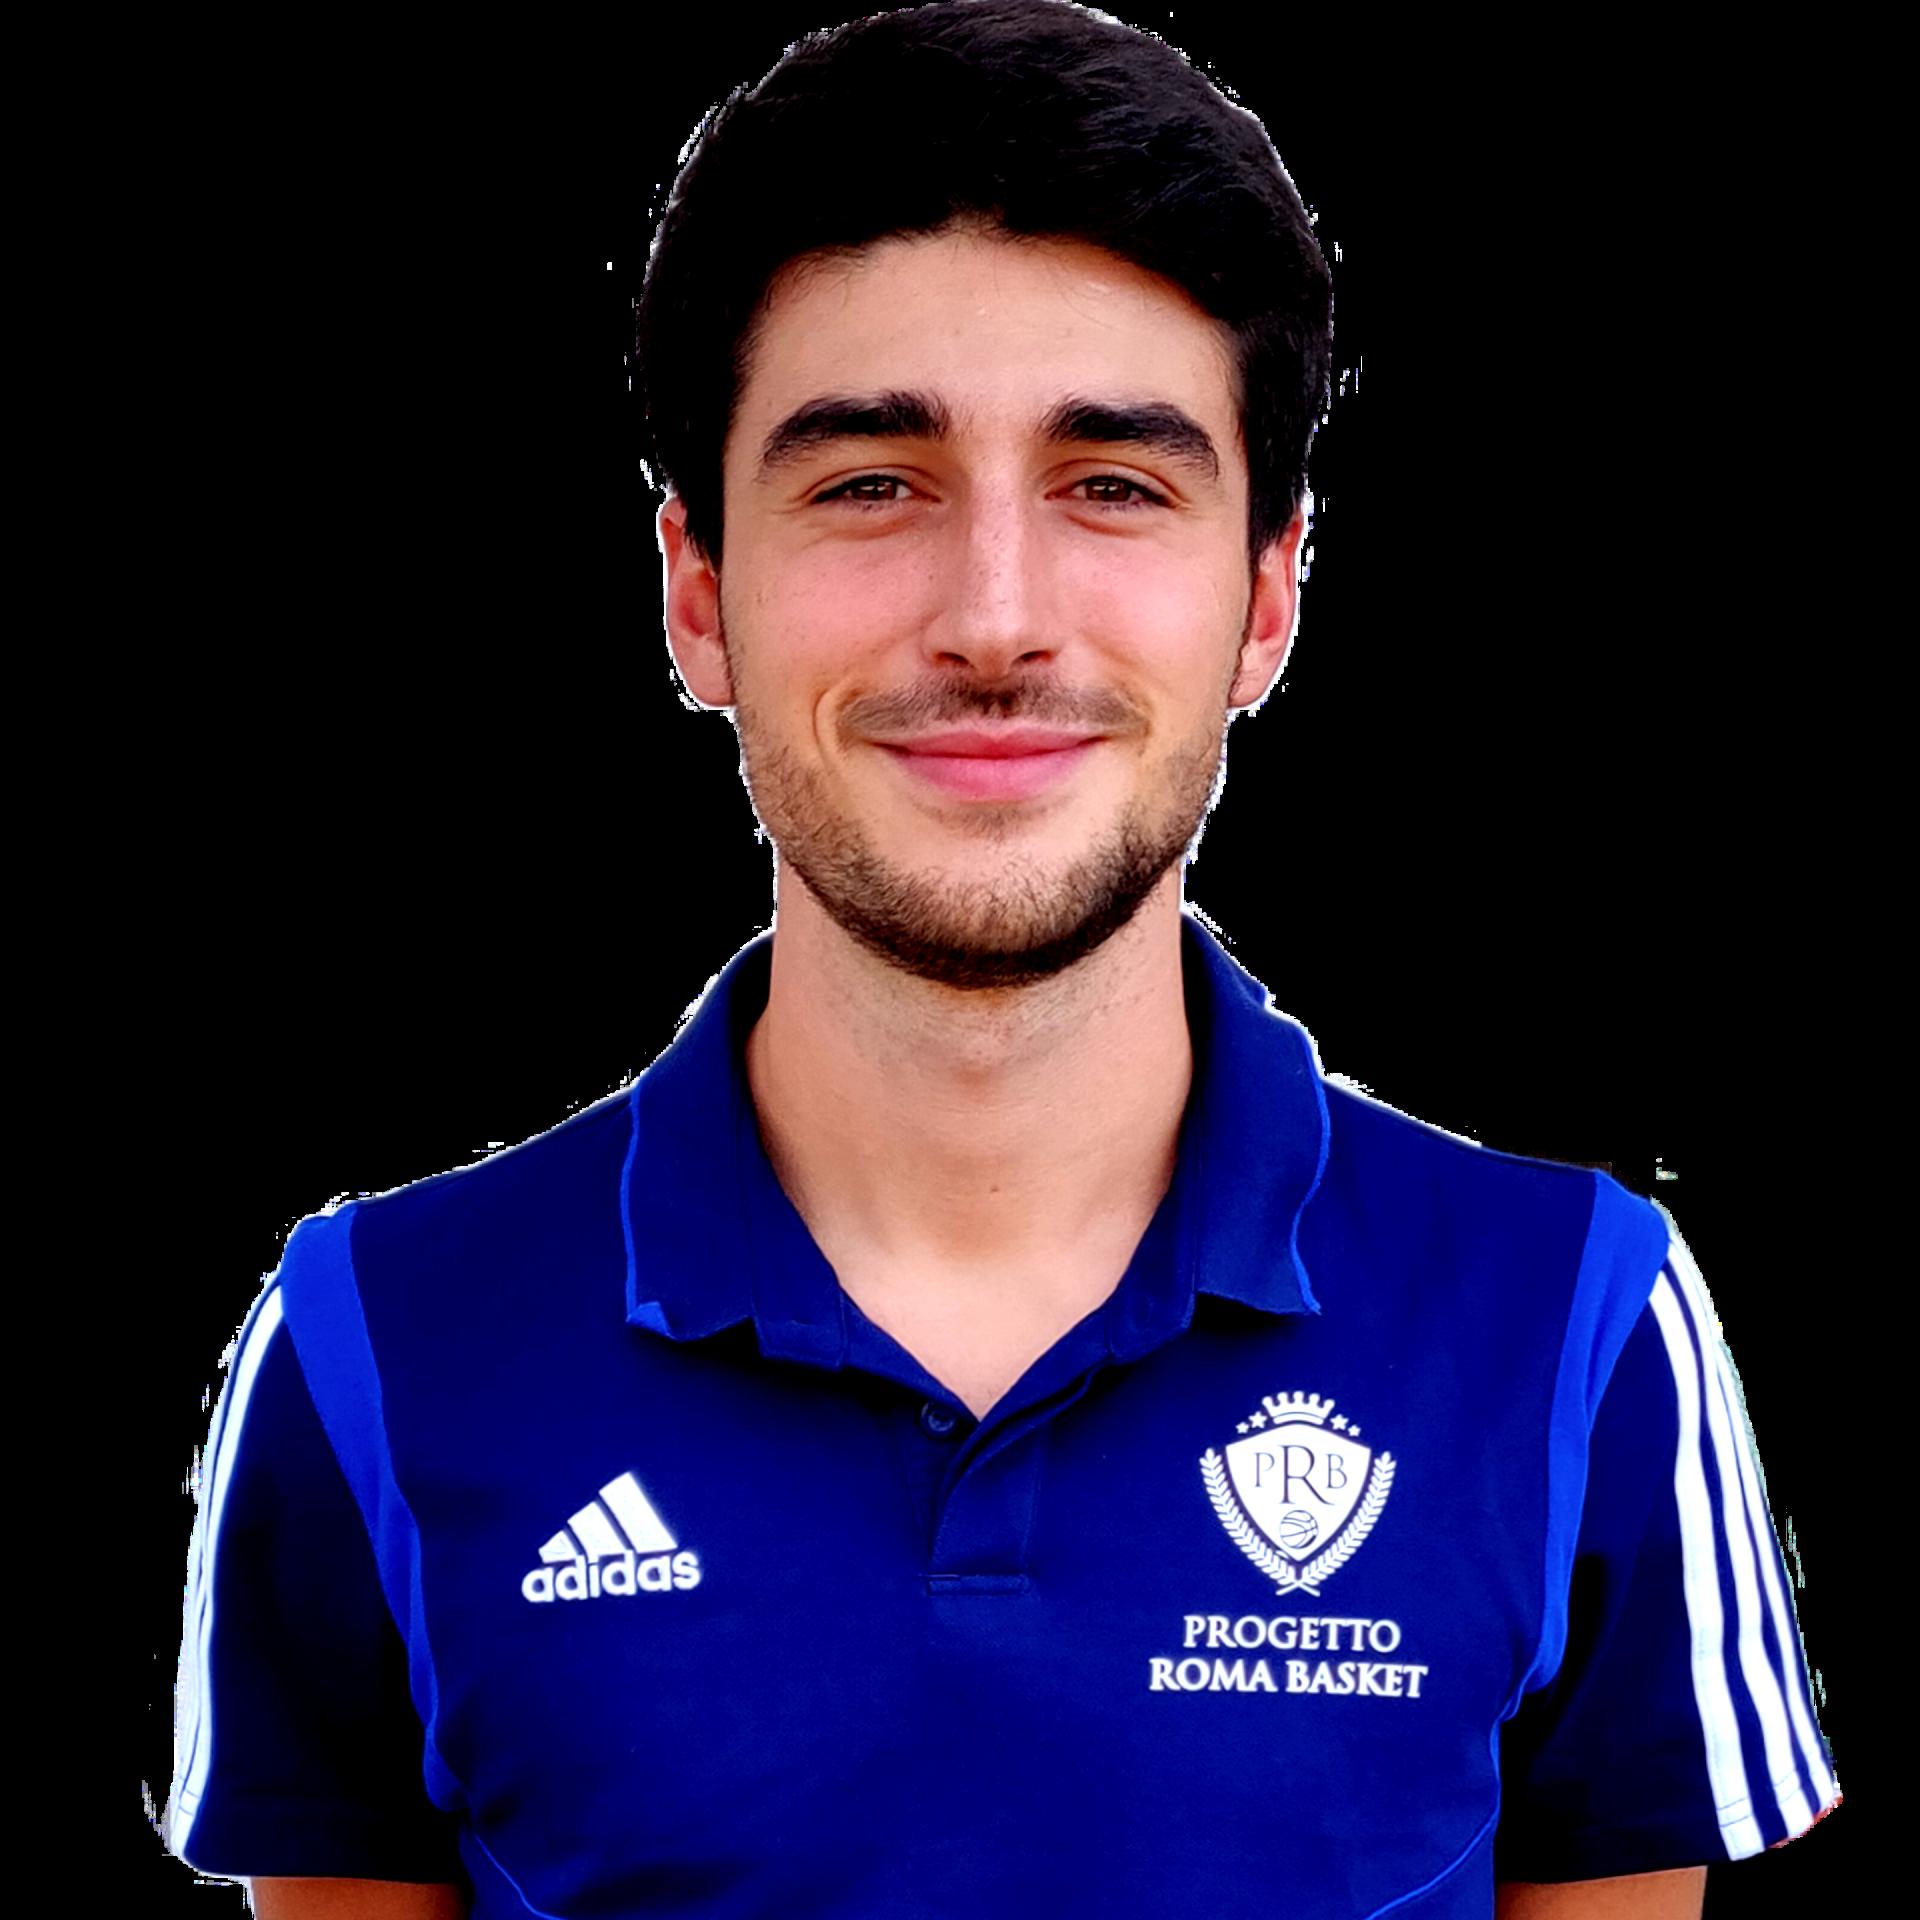 Matteo Frassica